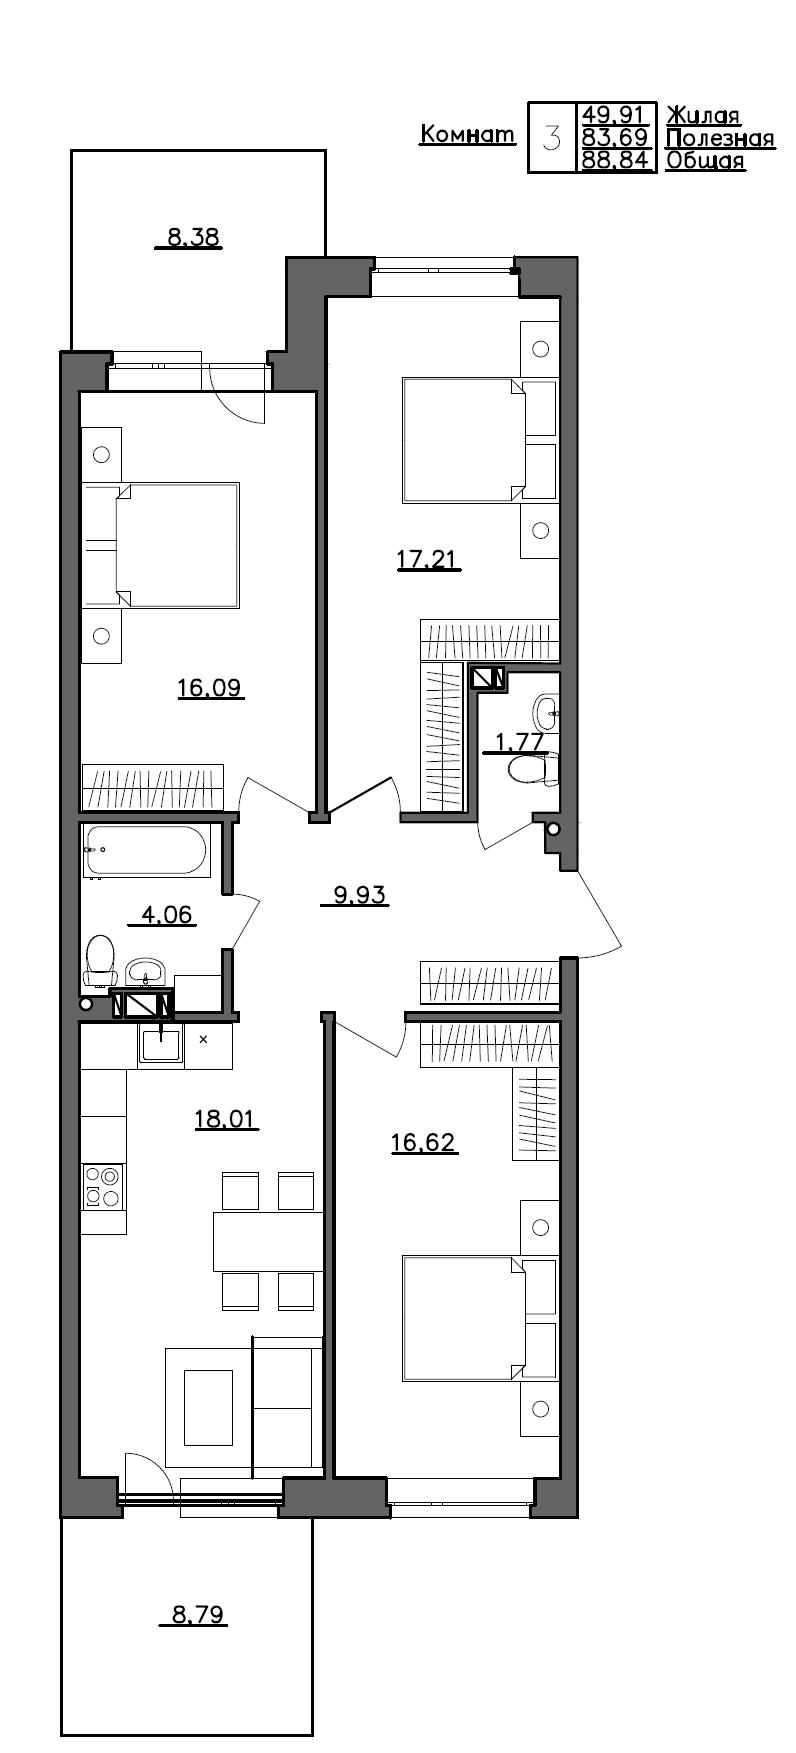 4Е-к.кв, 88.84 м²